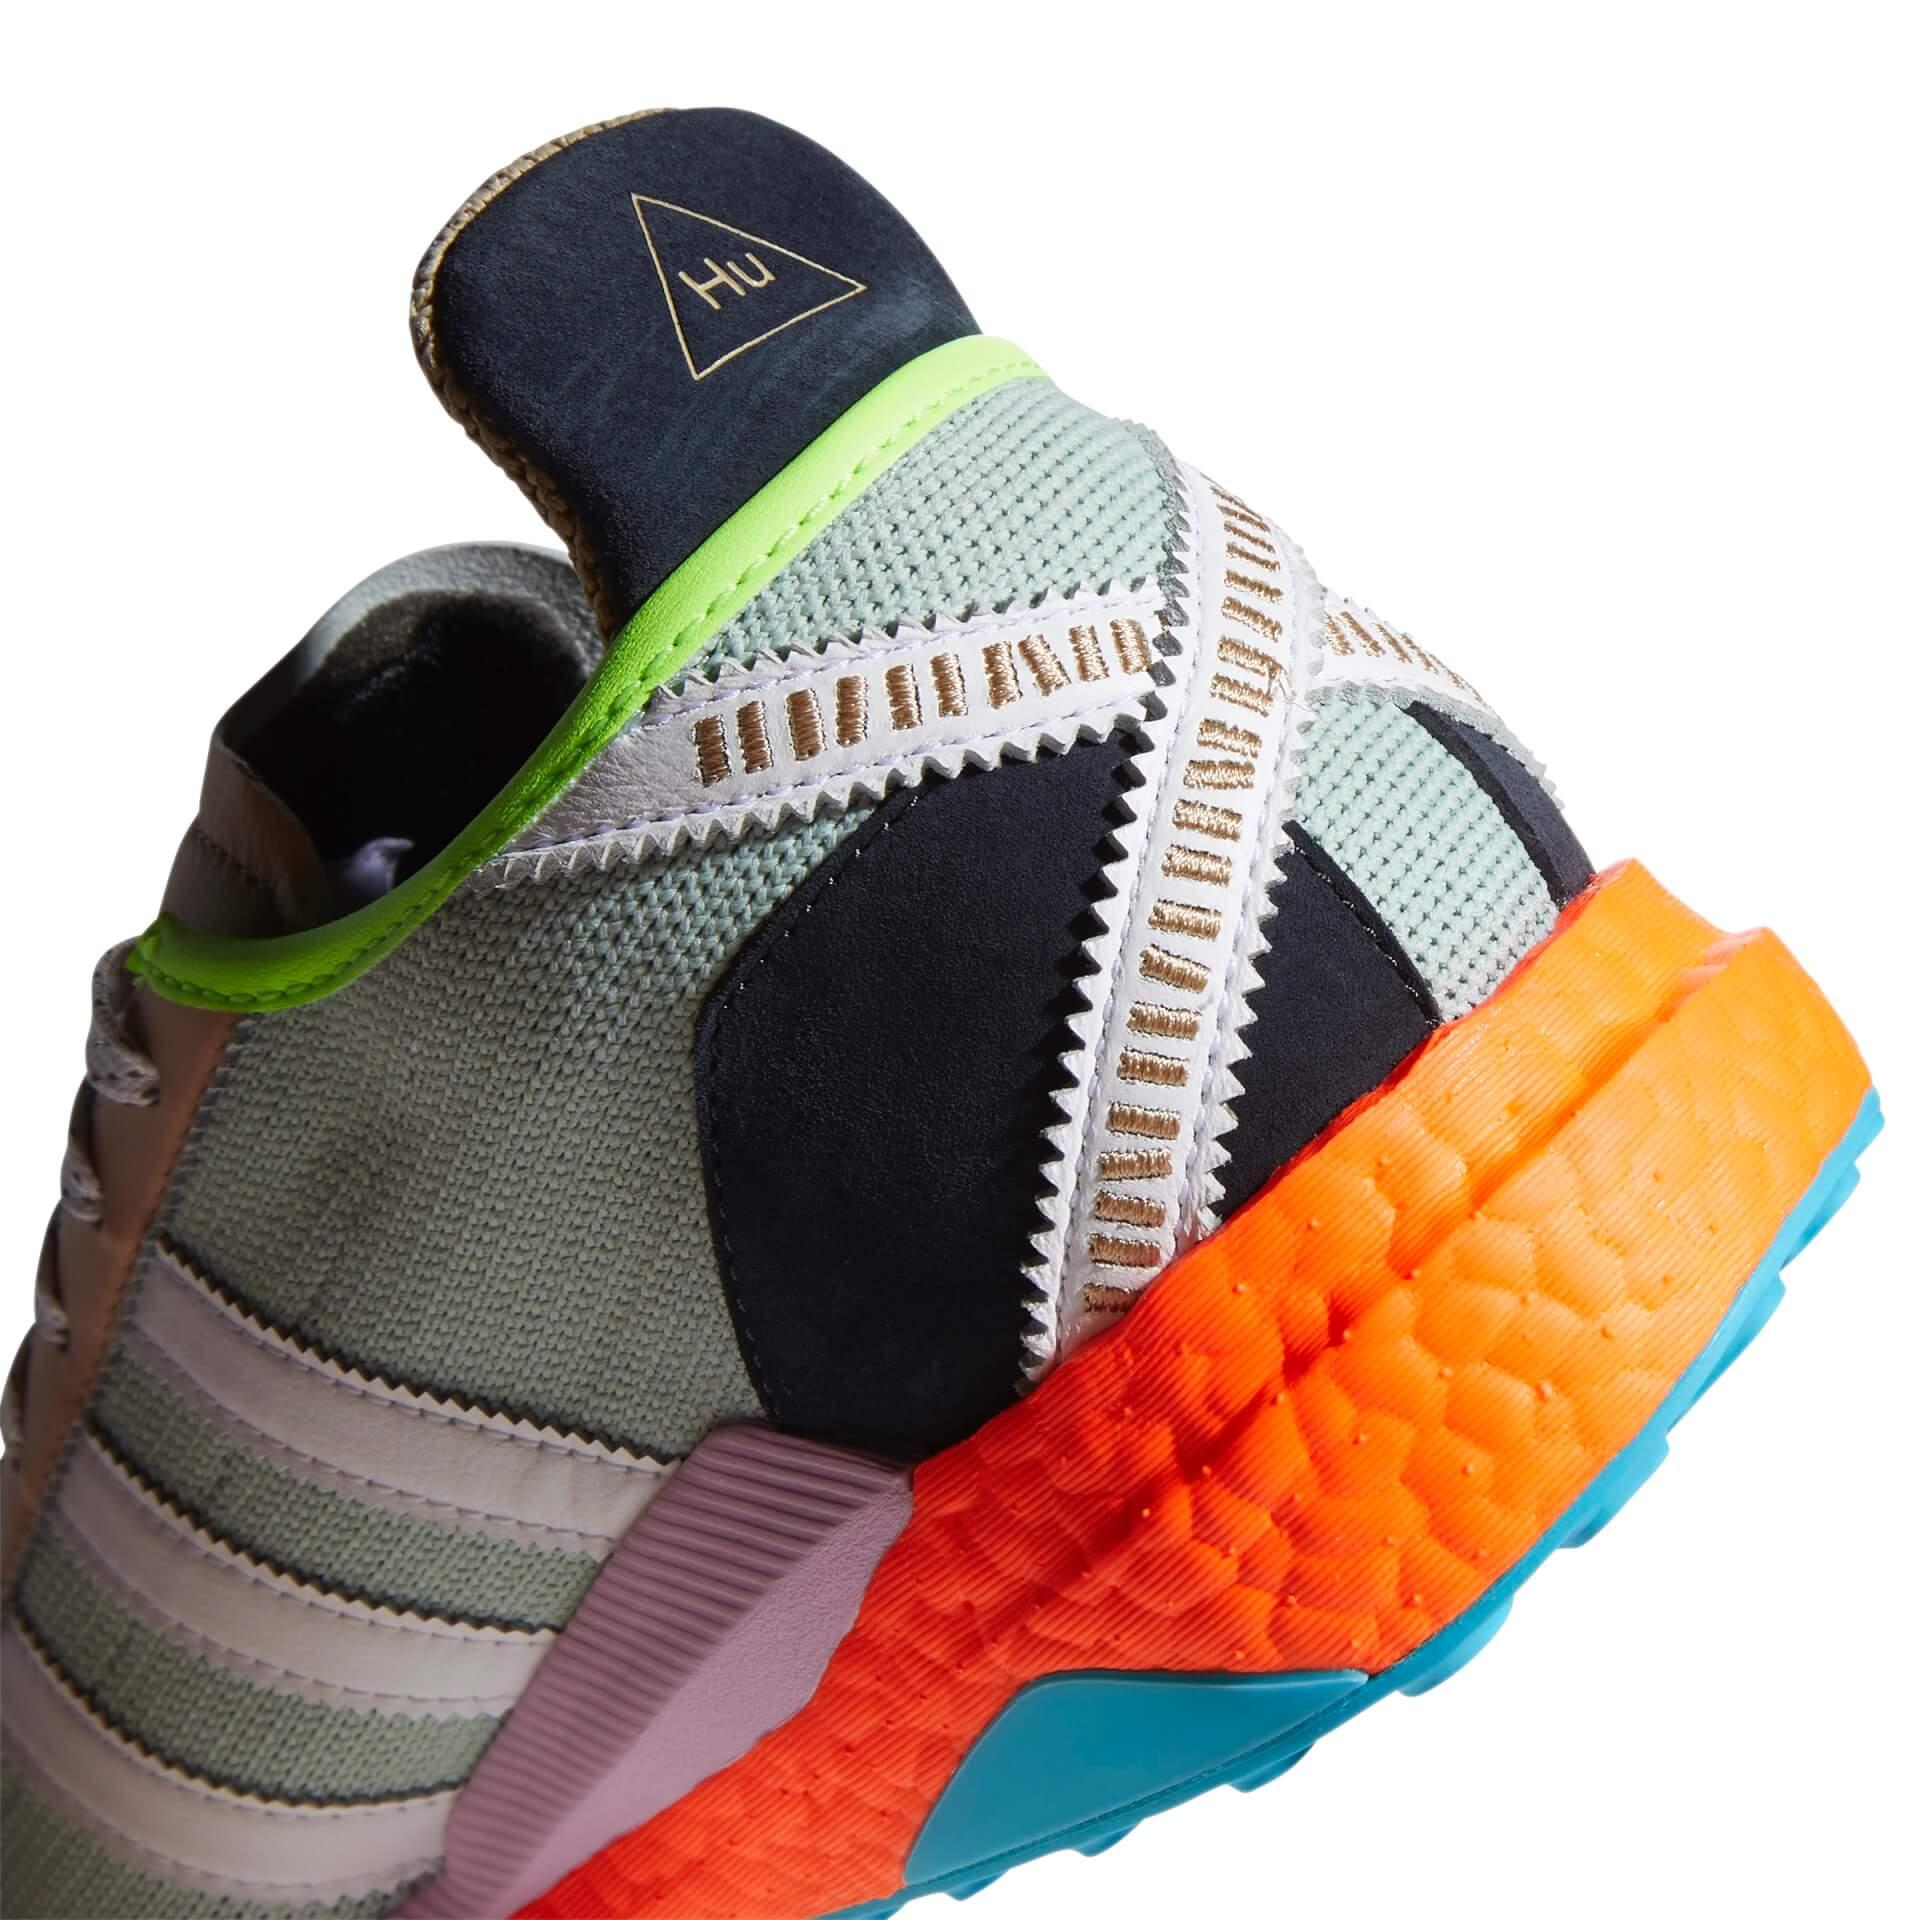 adidas Originalsから『Pharrell Williams x NIGO(R)FRIENDSHIP PACK』が発売!2種類のフットウェアが登場 fashion201217_adidas_pharrell_nigo_19